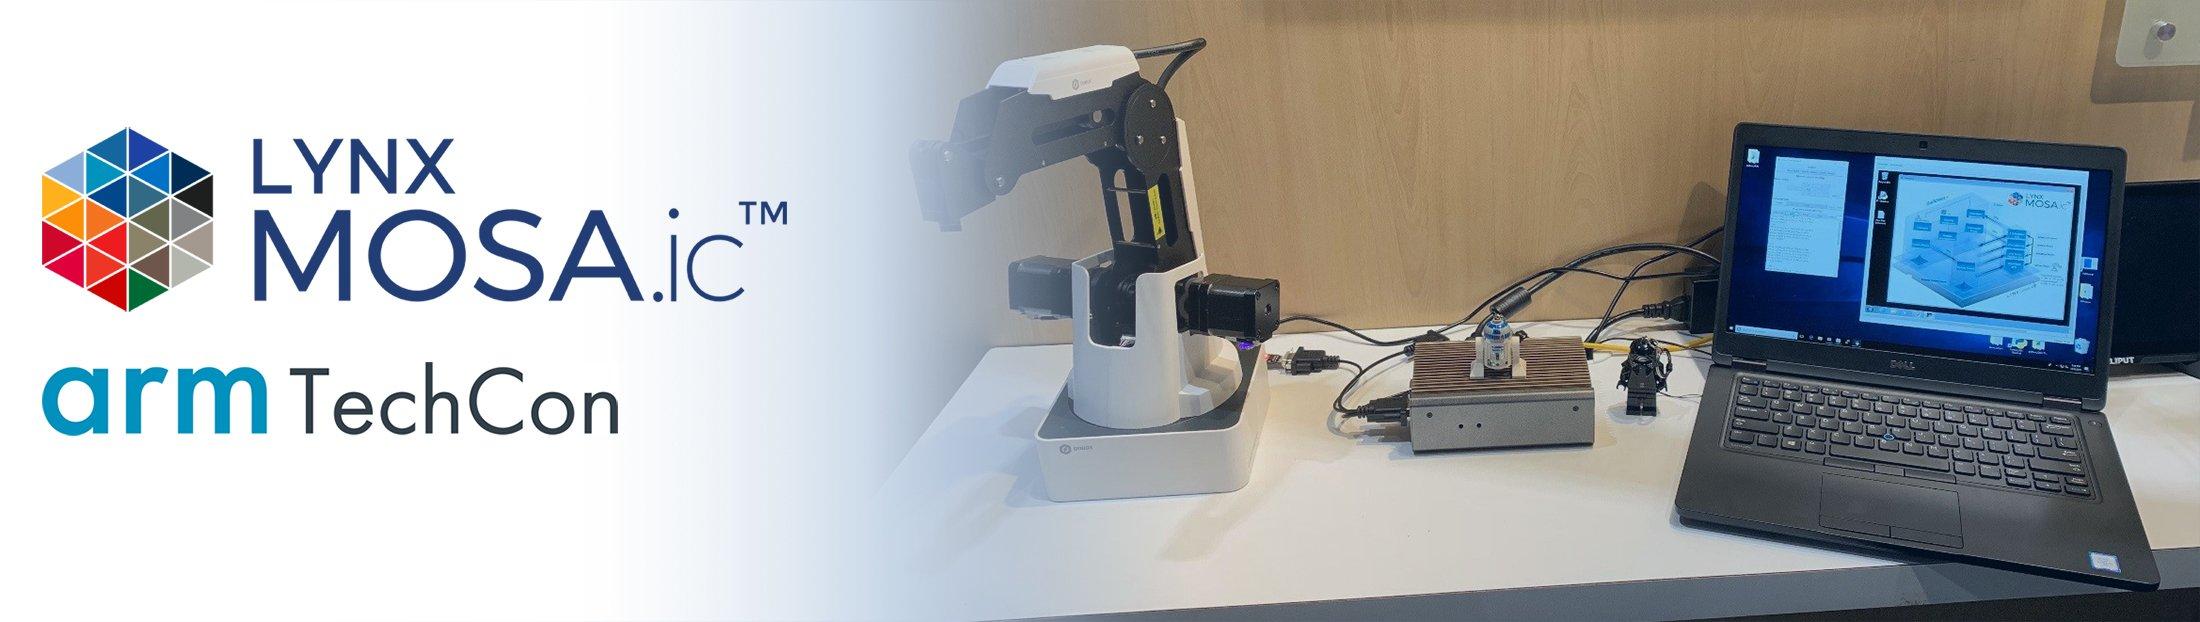 LYNX MOSA.ic™ Industrial Demo at Arm TechCon 03